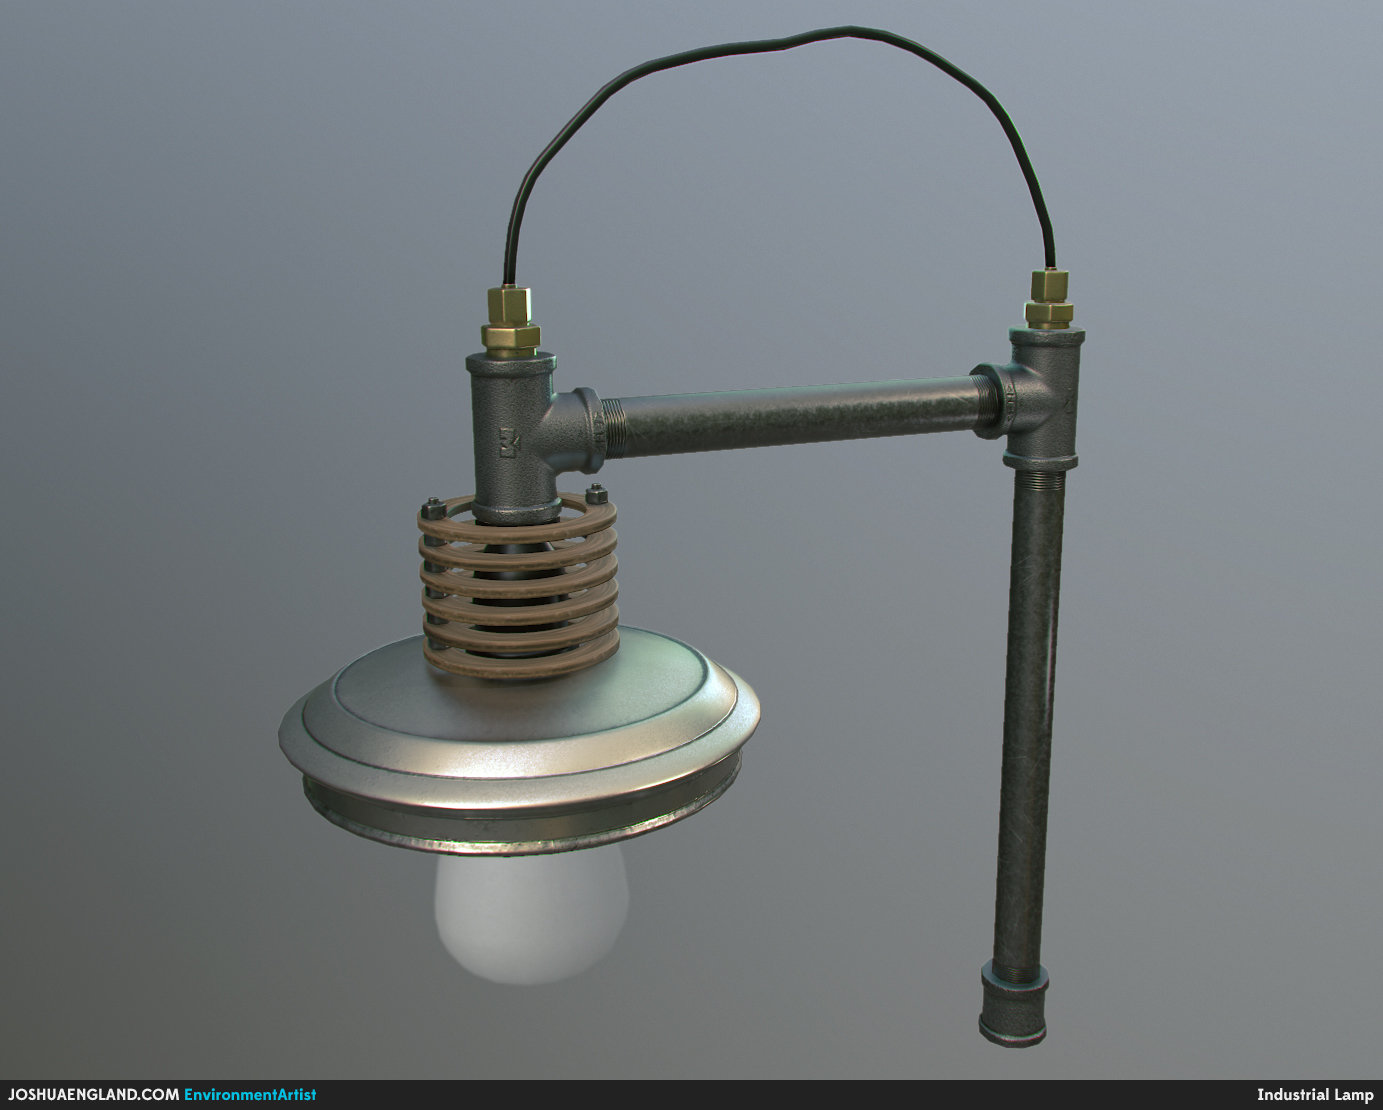 Joshua england industrial lamp front